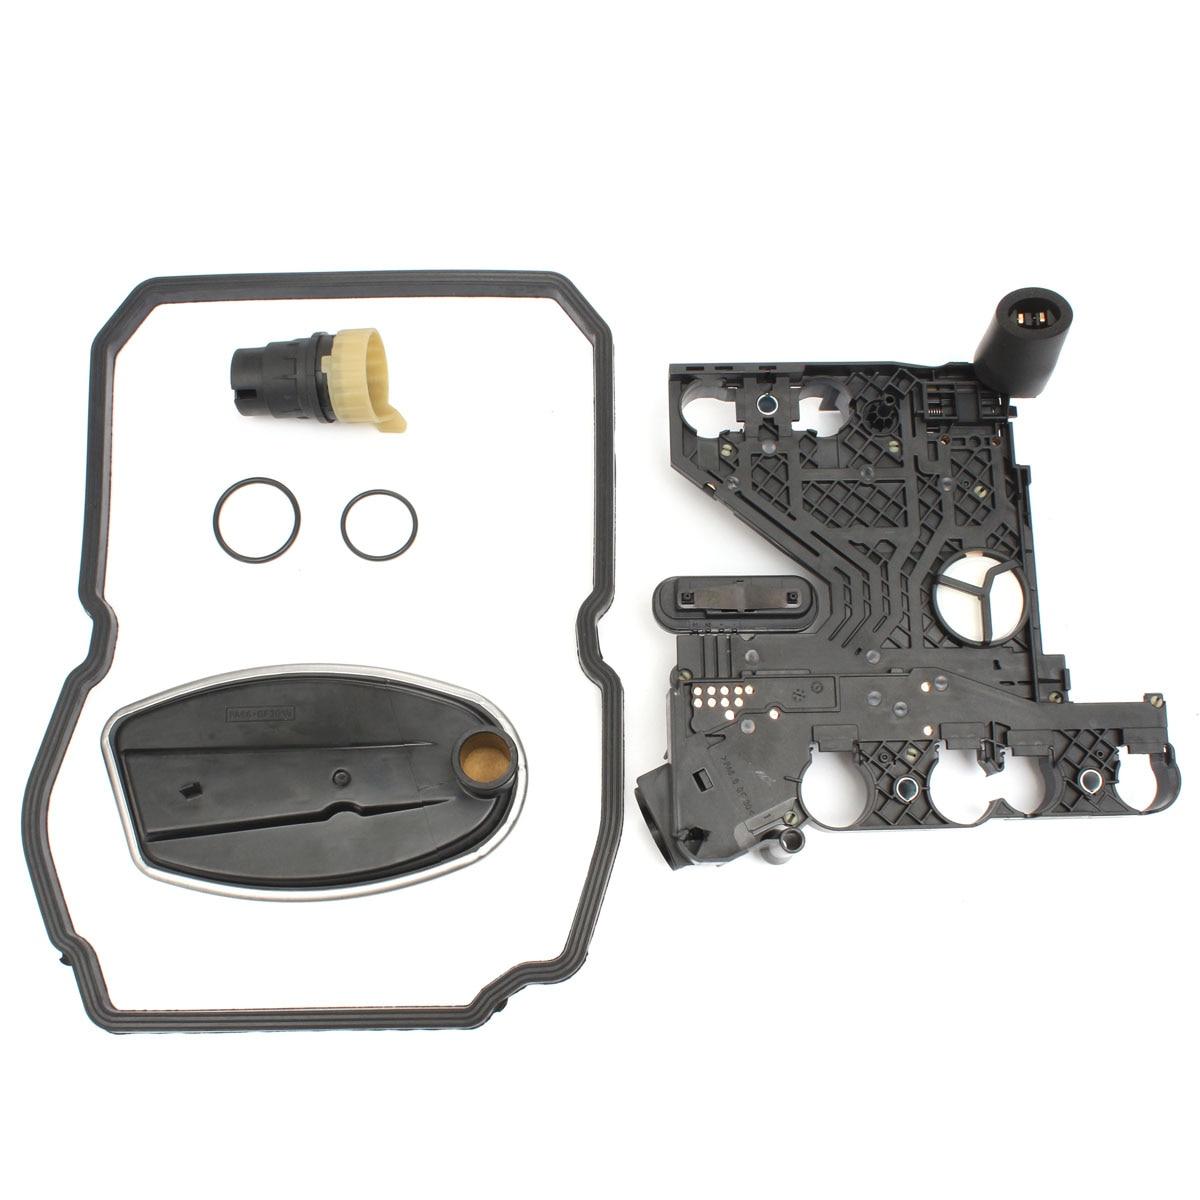 Kit de filtro de placa conductora de caja de cambios 722,6 para Mercedes Benz para 1402700161